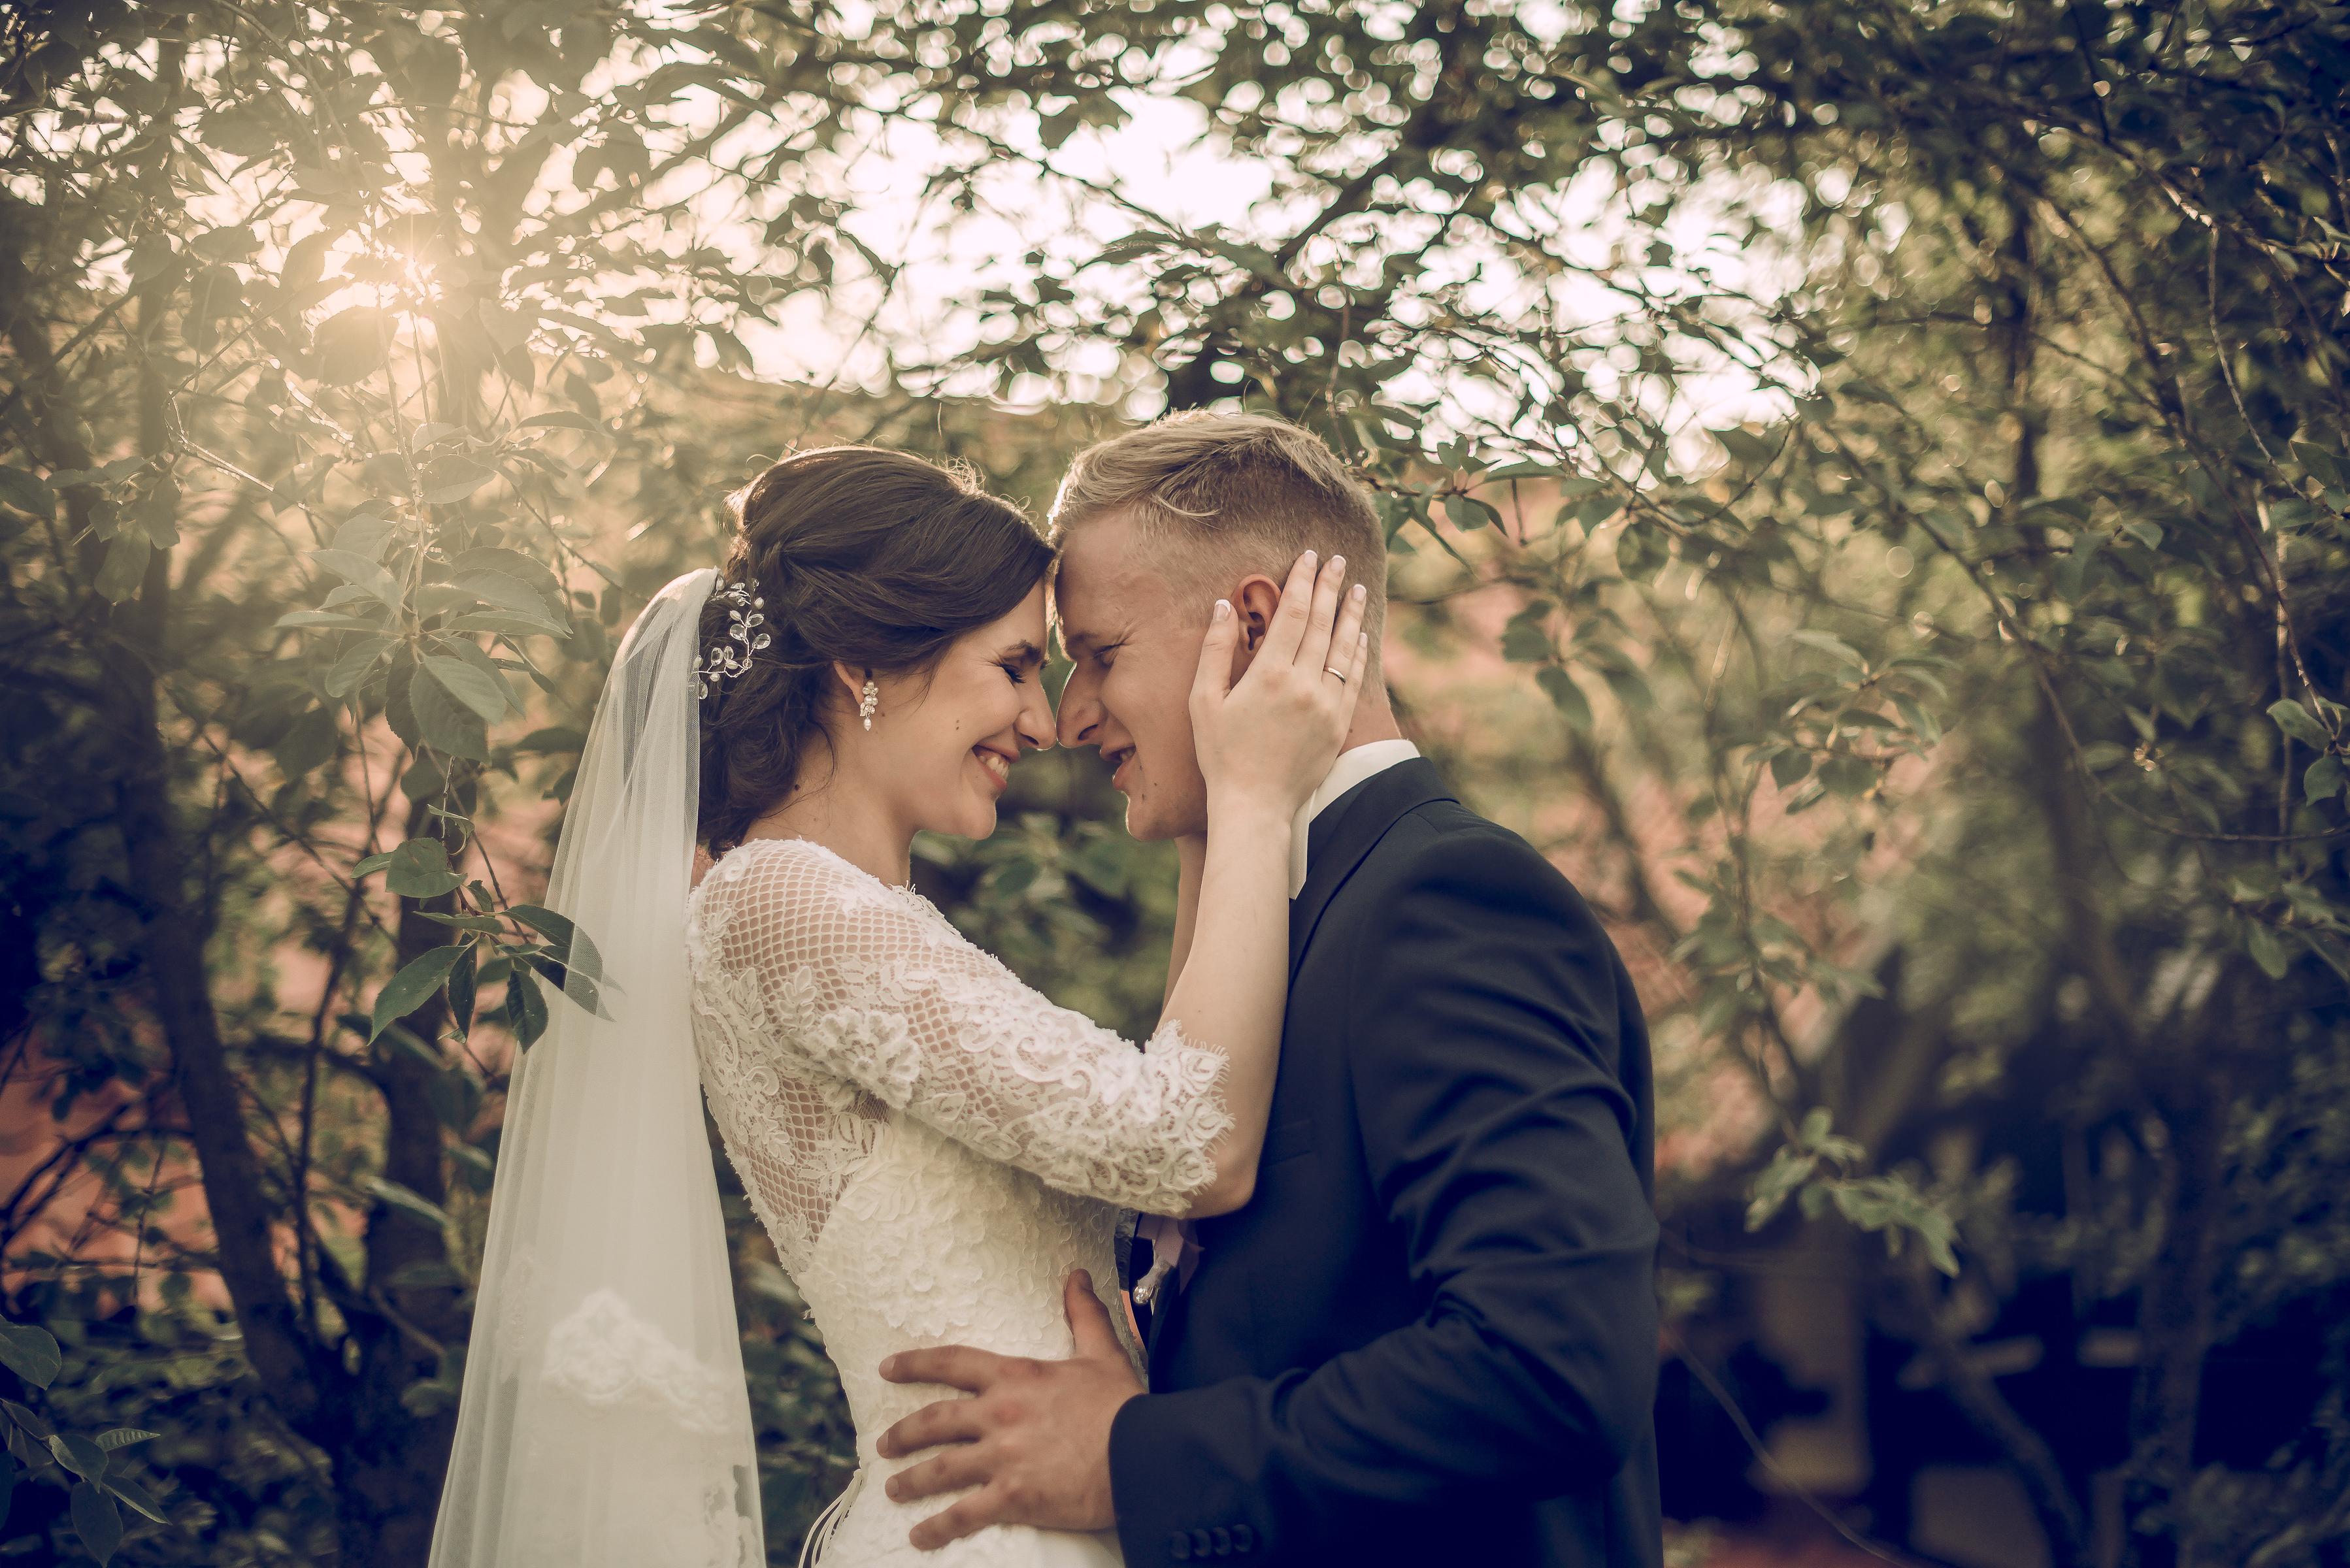 https://sleeklens.com/wp-content/uploads/2018/09/wedding-lightroom-presets-signature-bride-groom-after-5.jpg